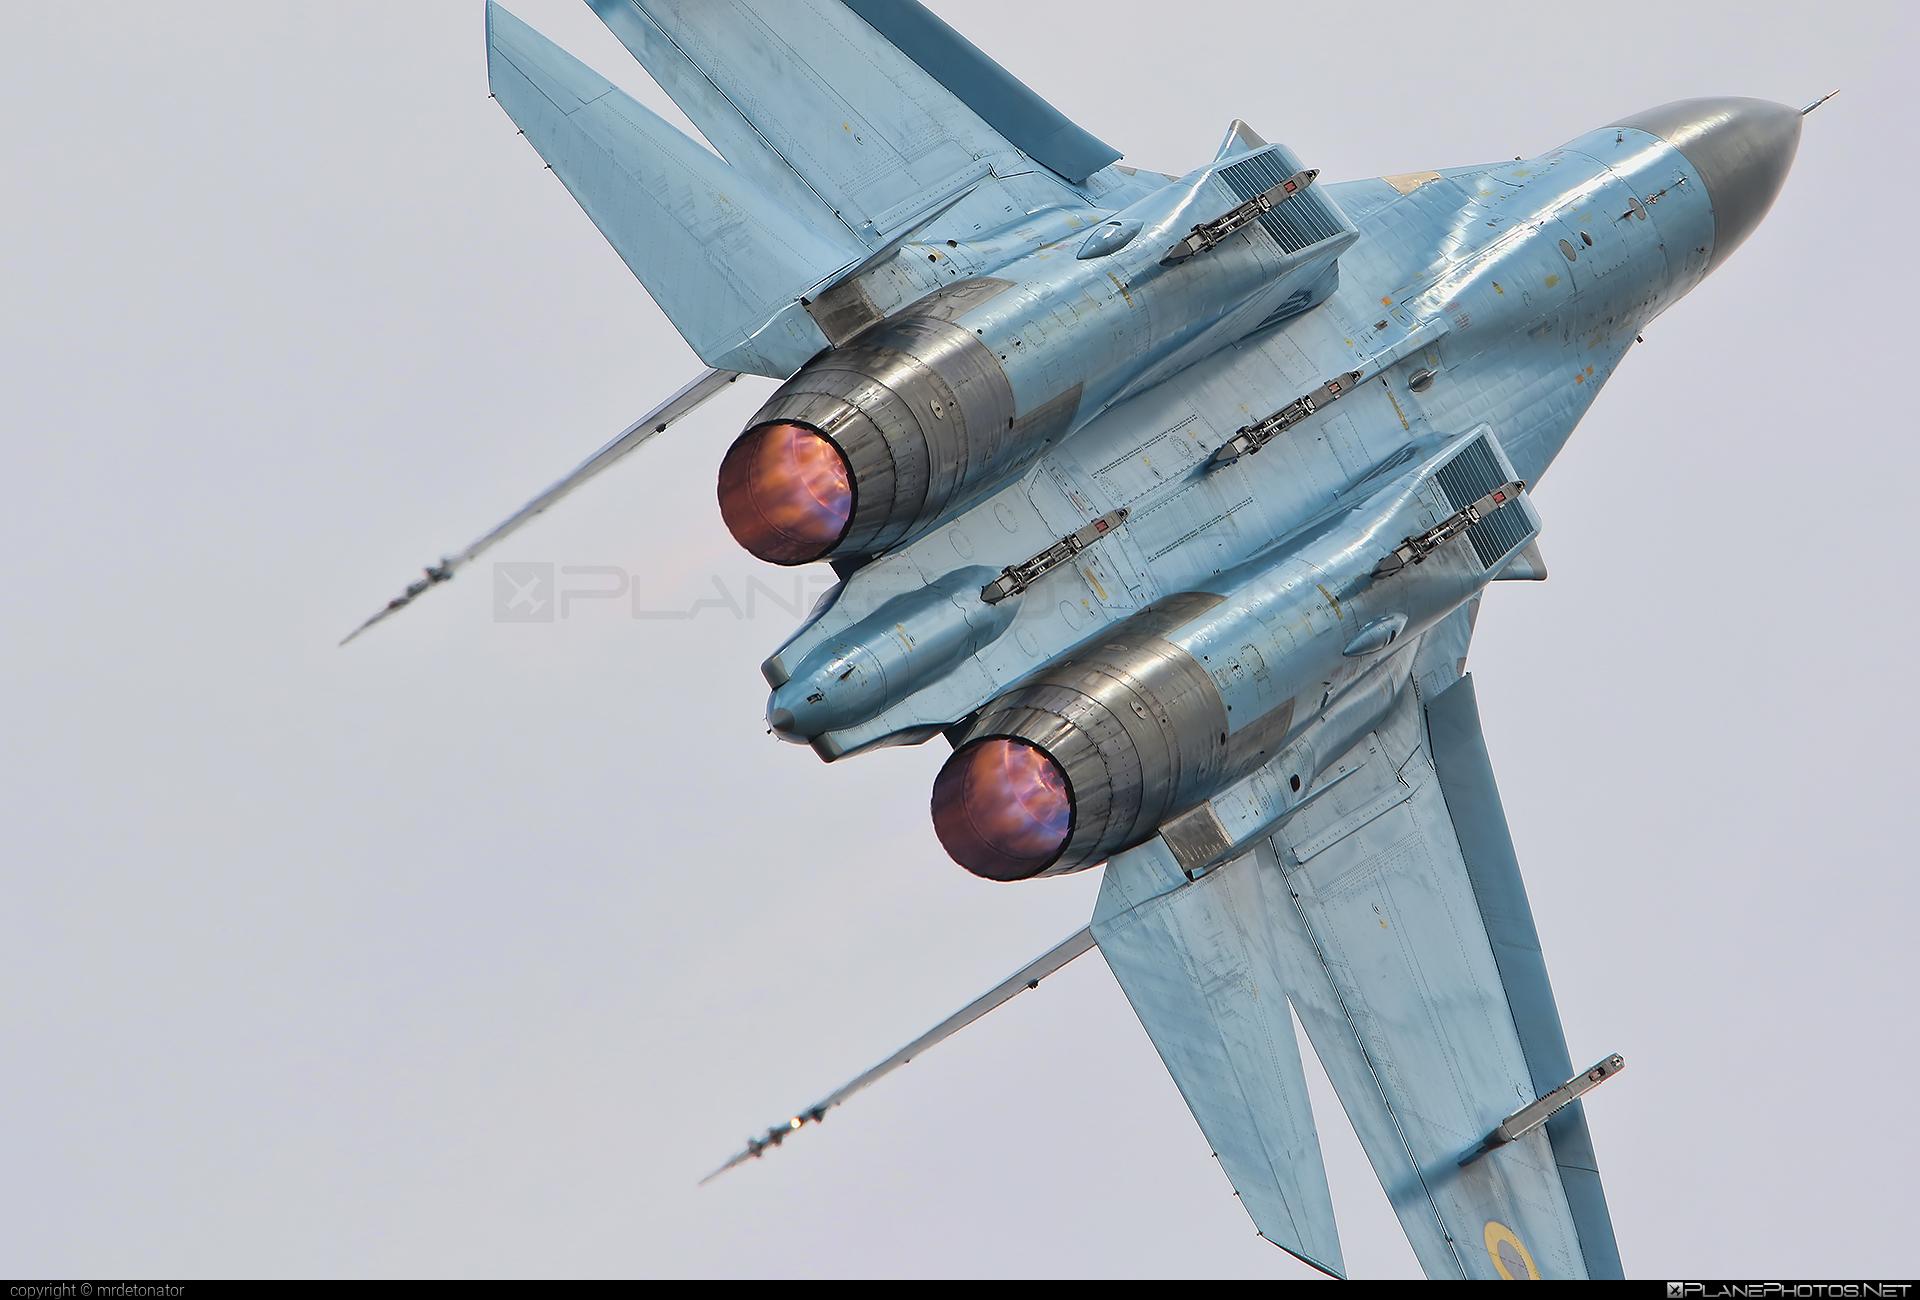 Sukhoi Su-27P - 58 operated by Povitryani Syly Ukrayiny (Ukrainian Air Force) #povitryanisylyukrayiny #su27 #su27p #sukhoi #sukhoi27 #ukrainianairforce